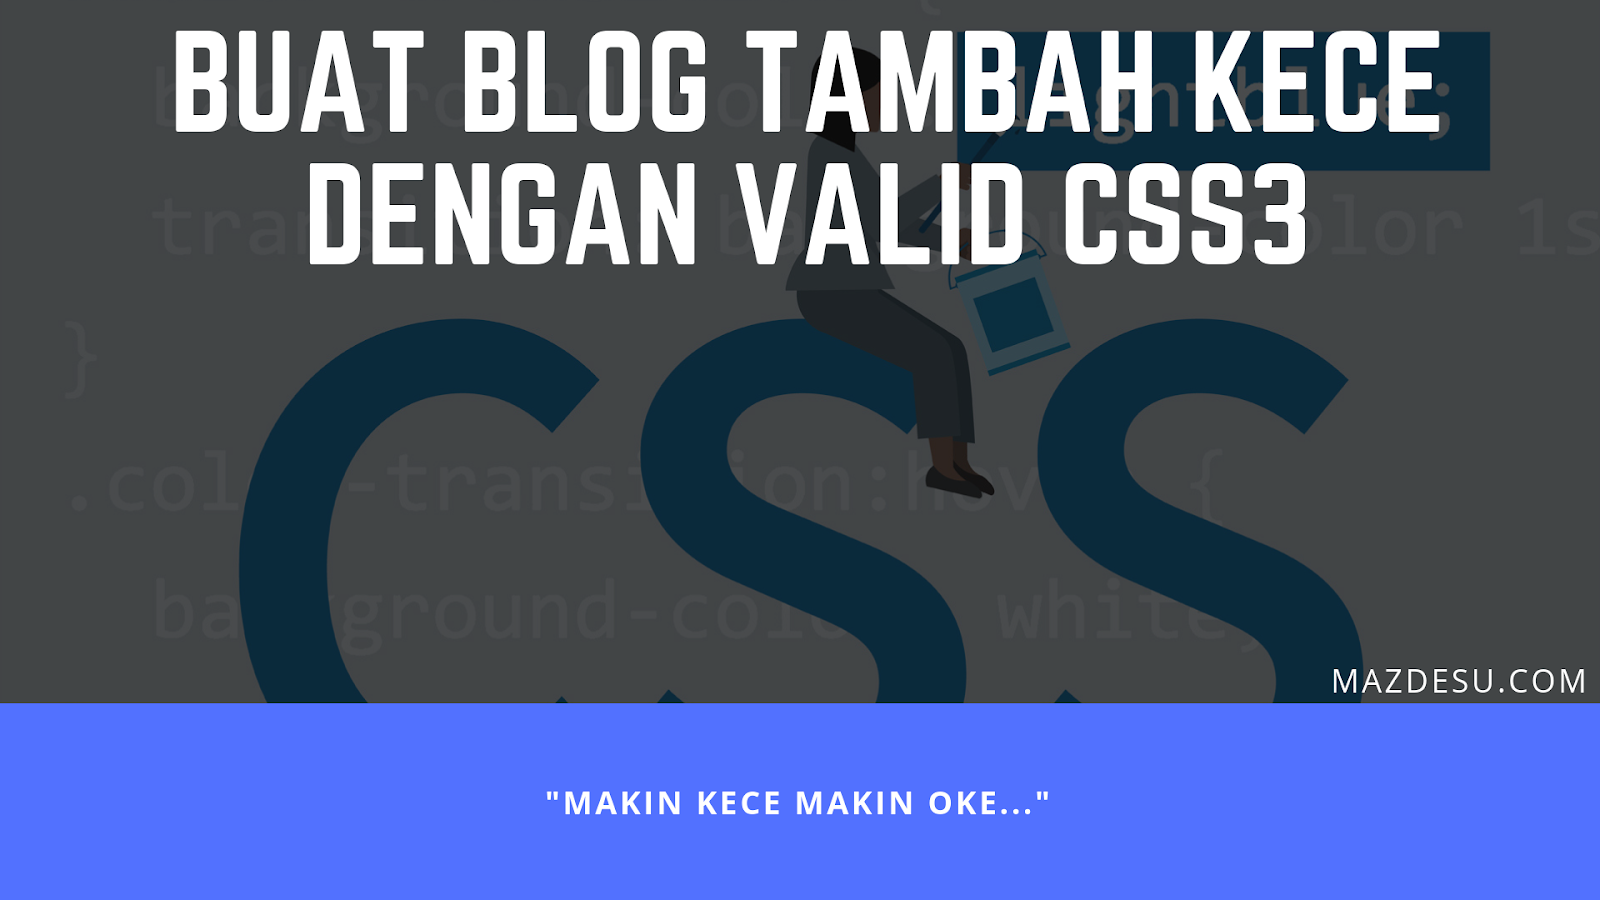 Buat Blogmu Makin Kece Dengan Valid CSS3